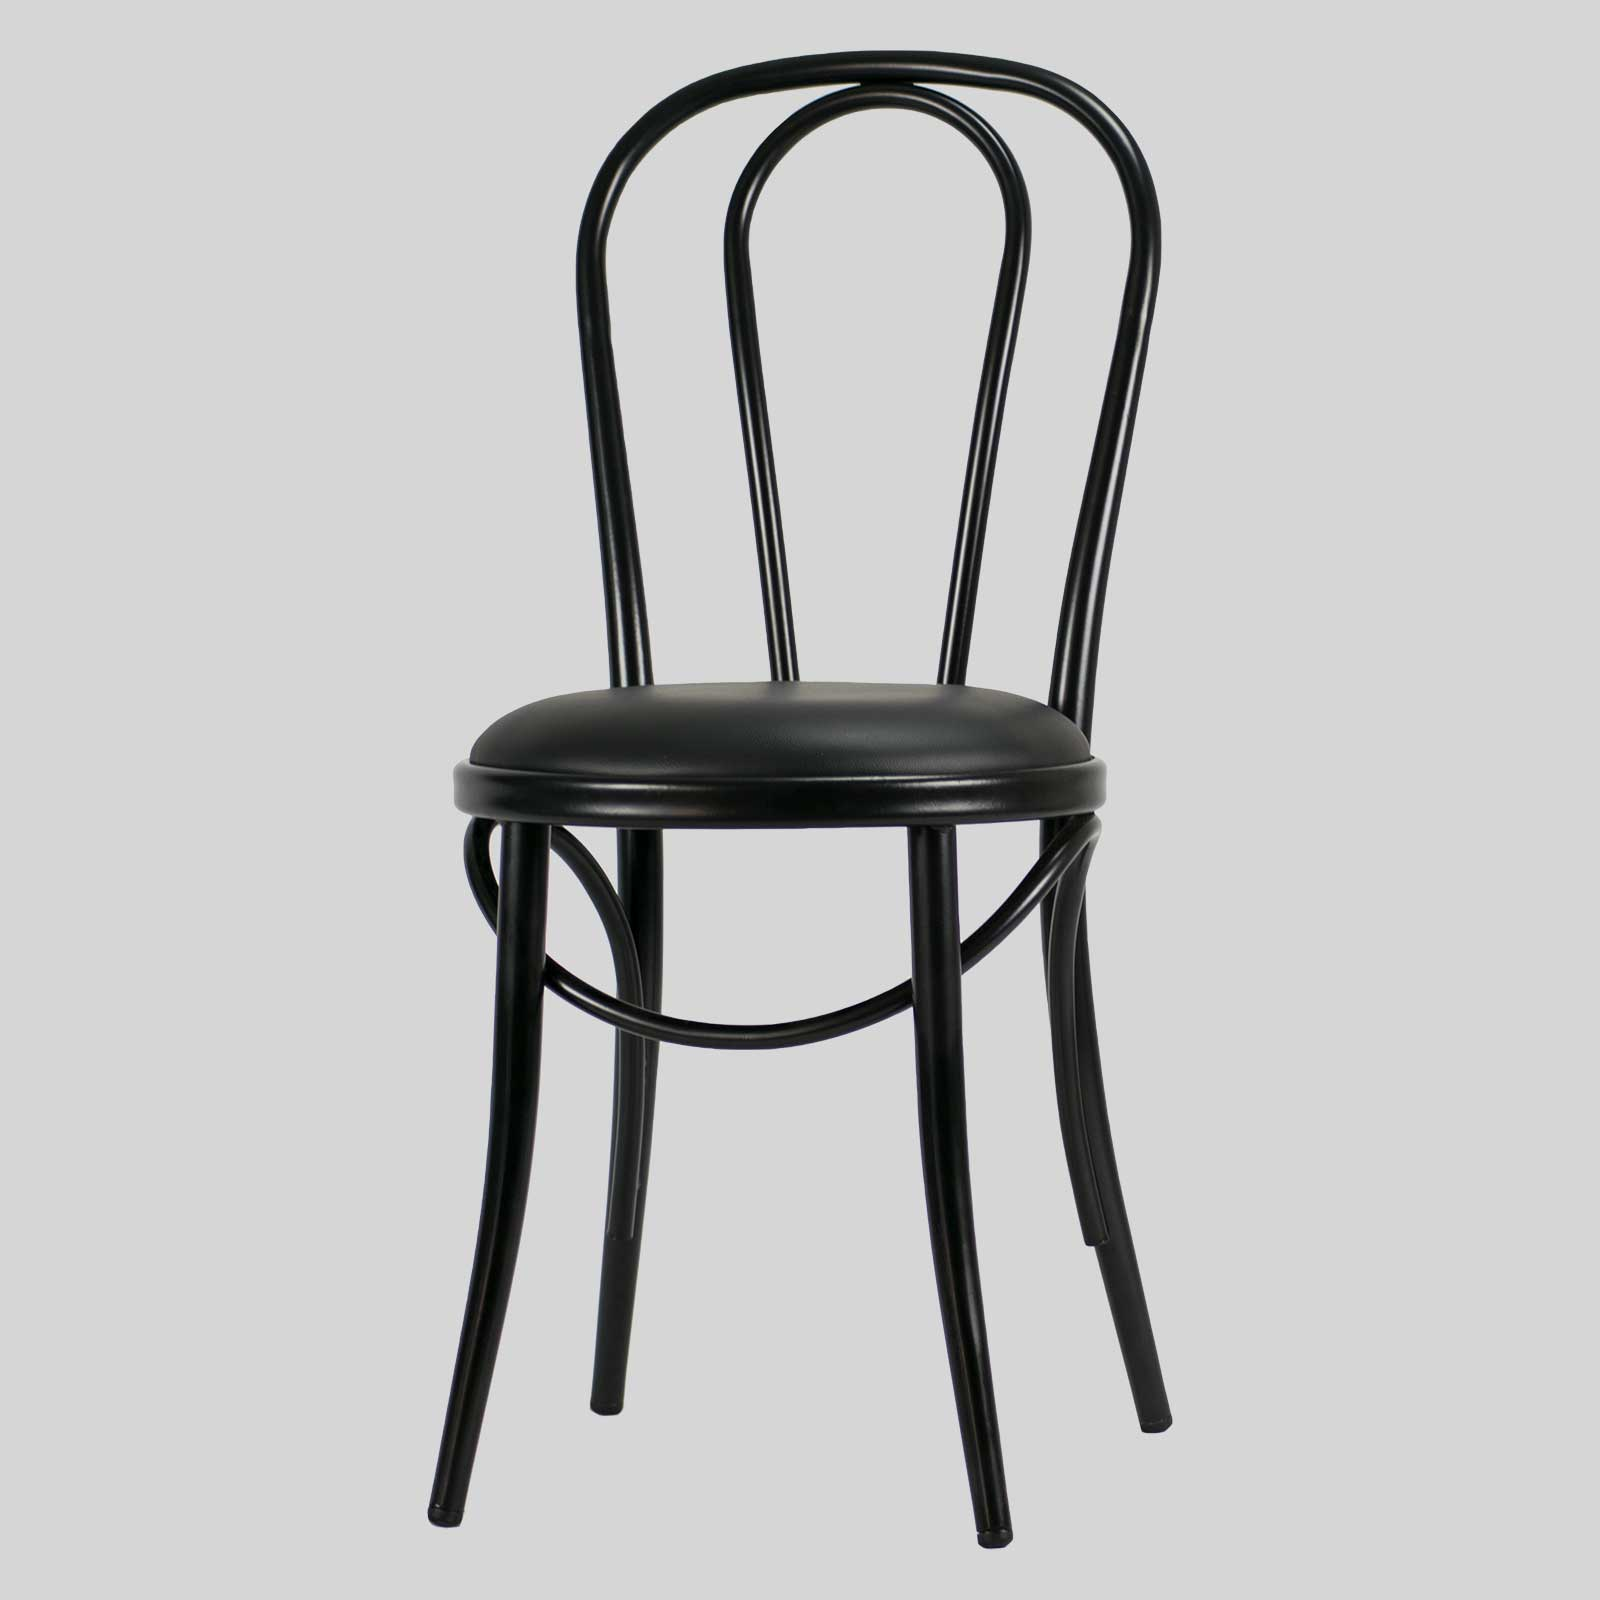 Bentwood Chair For Bistros Coleman Bistro Concept